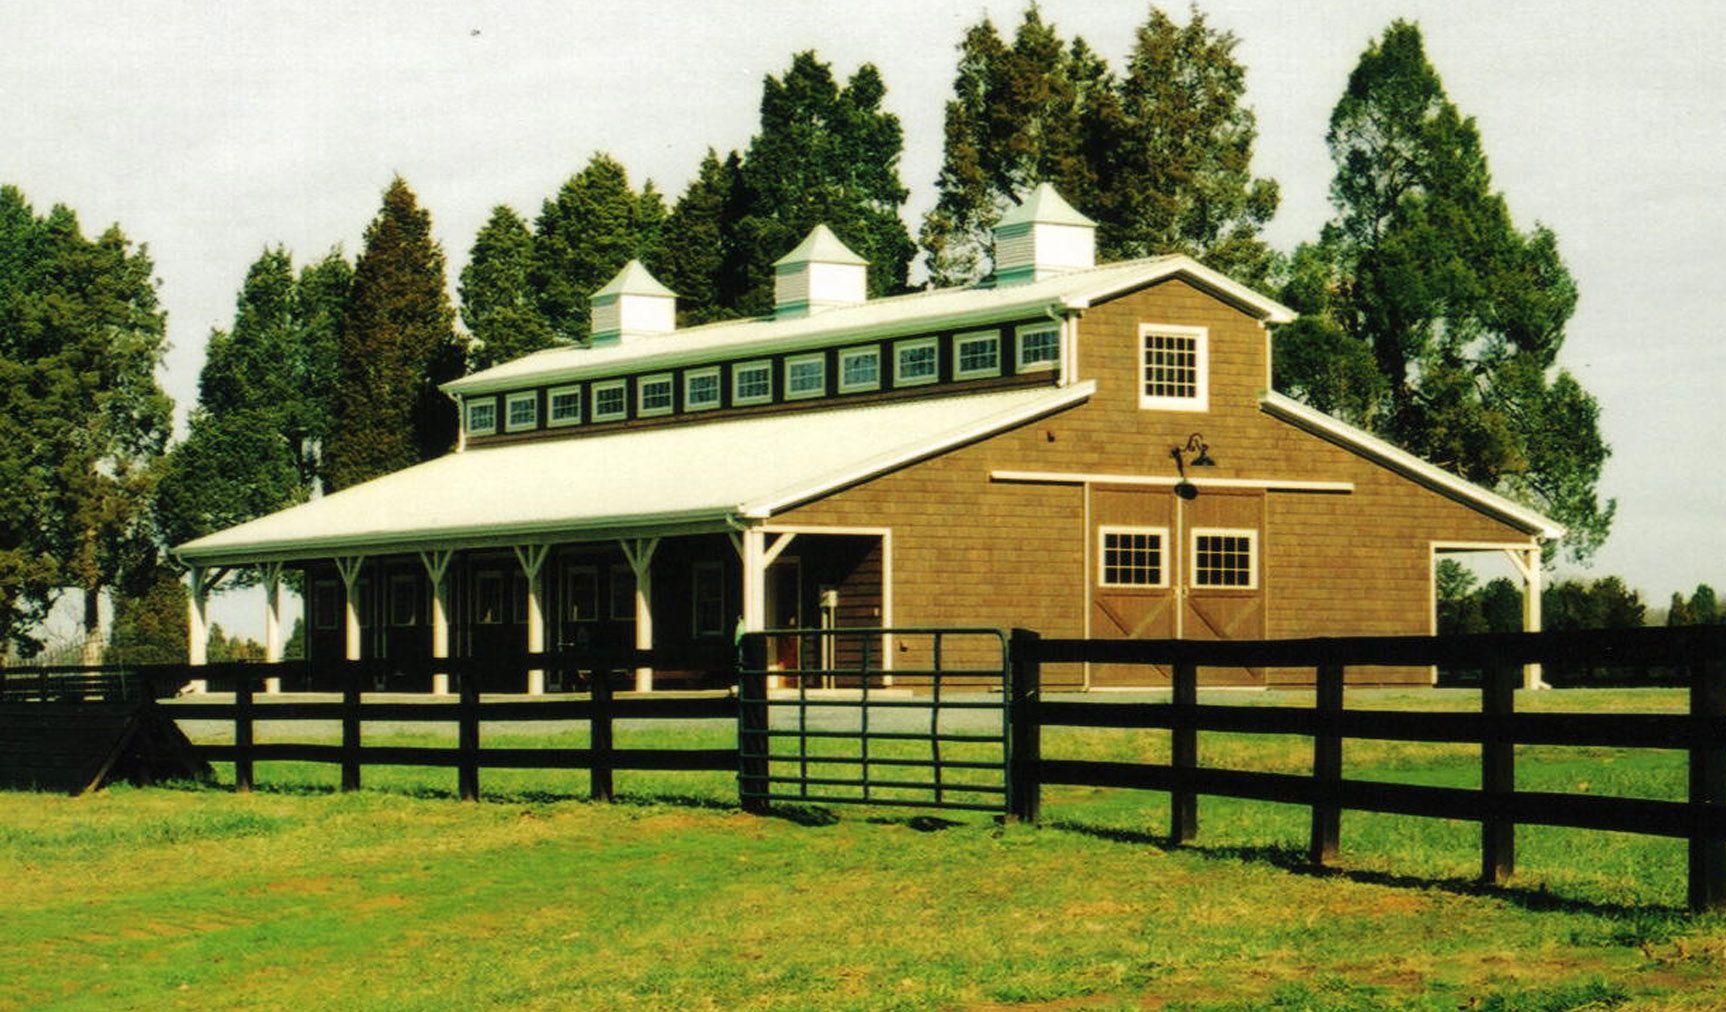 Barn Designs 52 39 X 72 39 Horse Barn Barns Pinterest